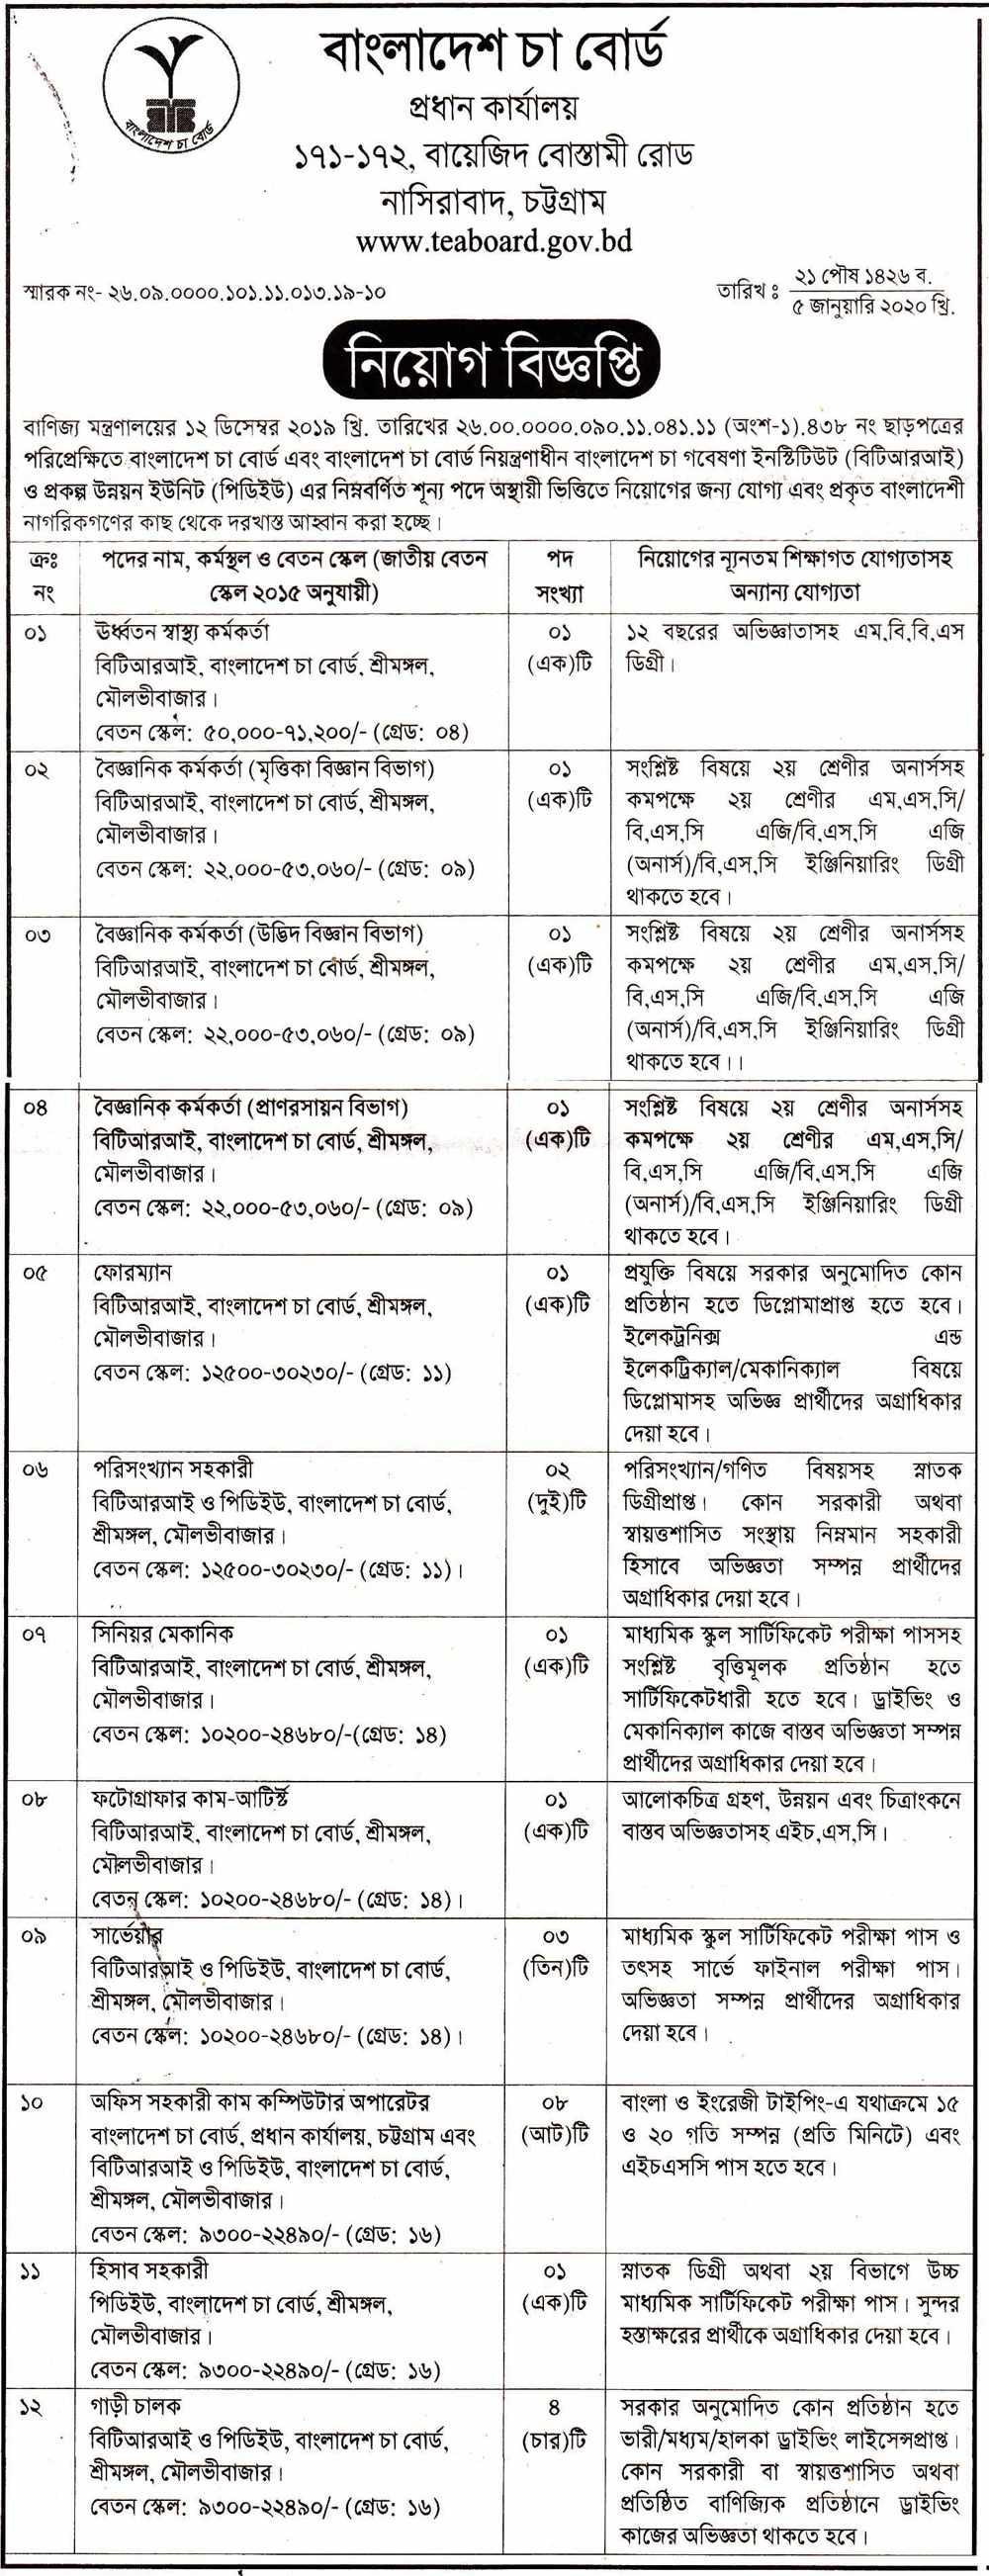 www.teaboard.gov.bd